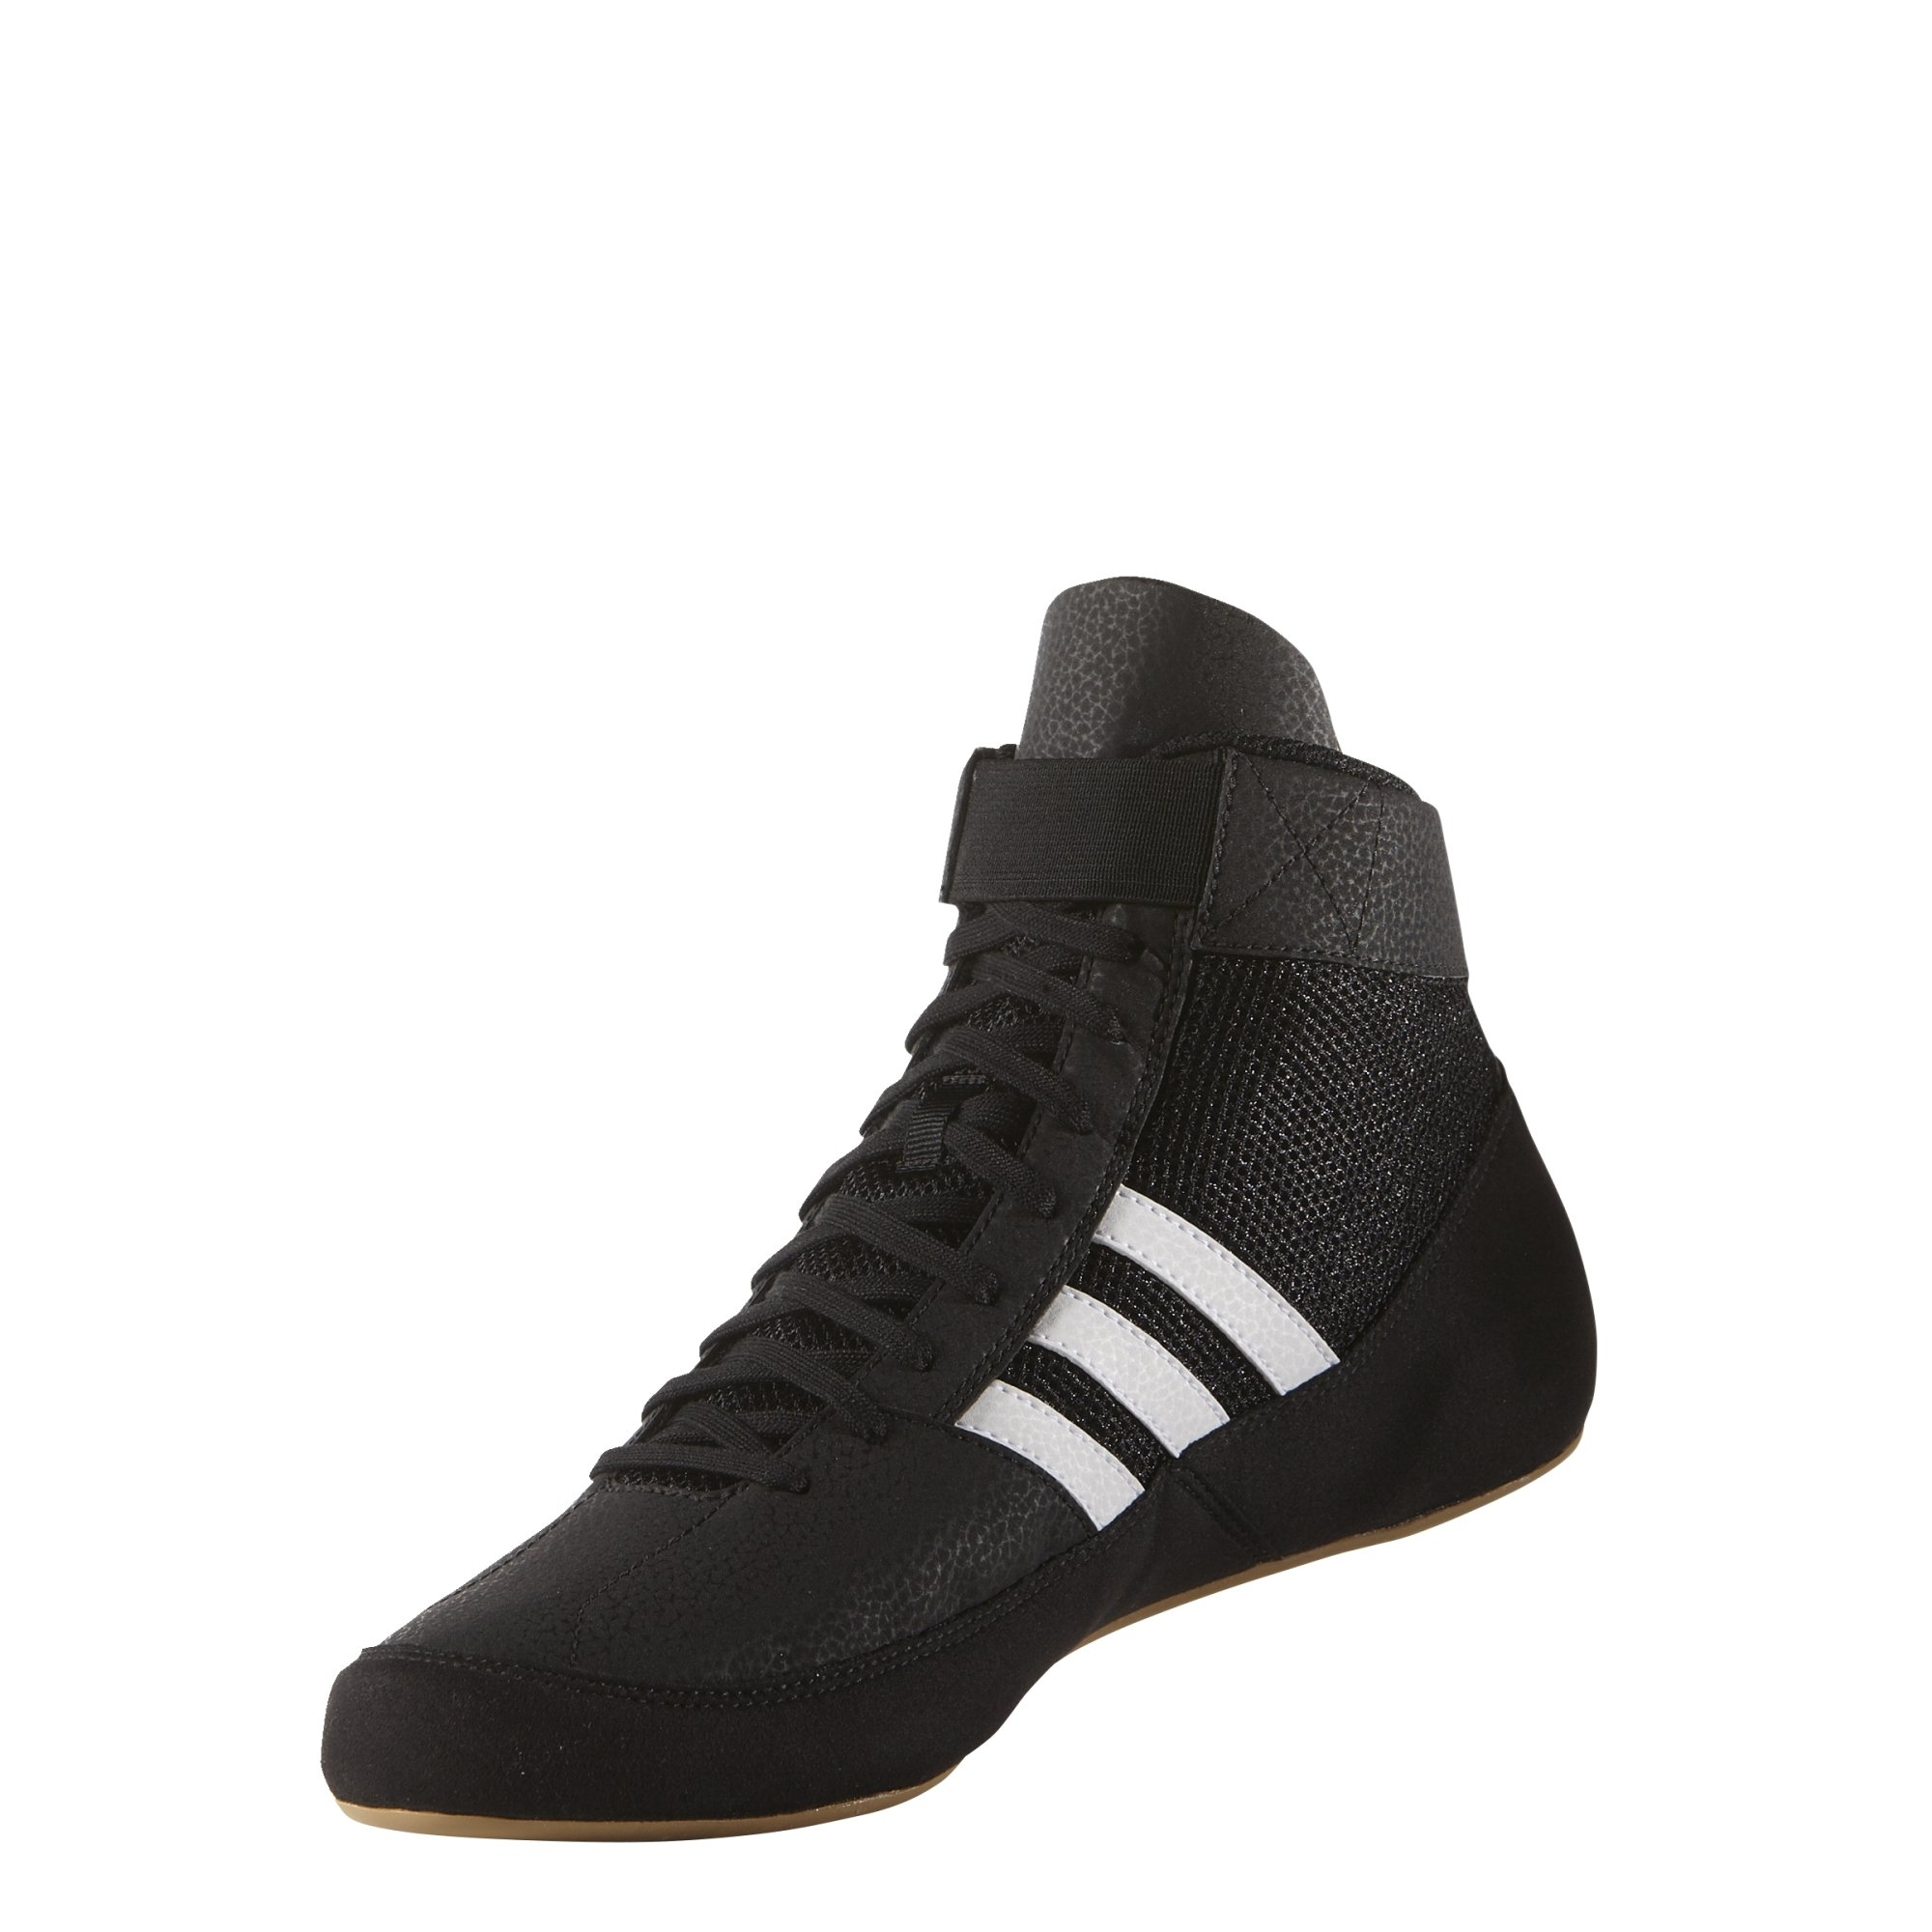 adidas Hvc 2 Black/White Wrestling Shoes 8.5 by adidas